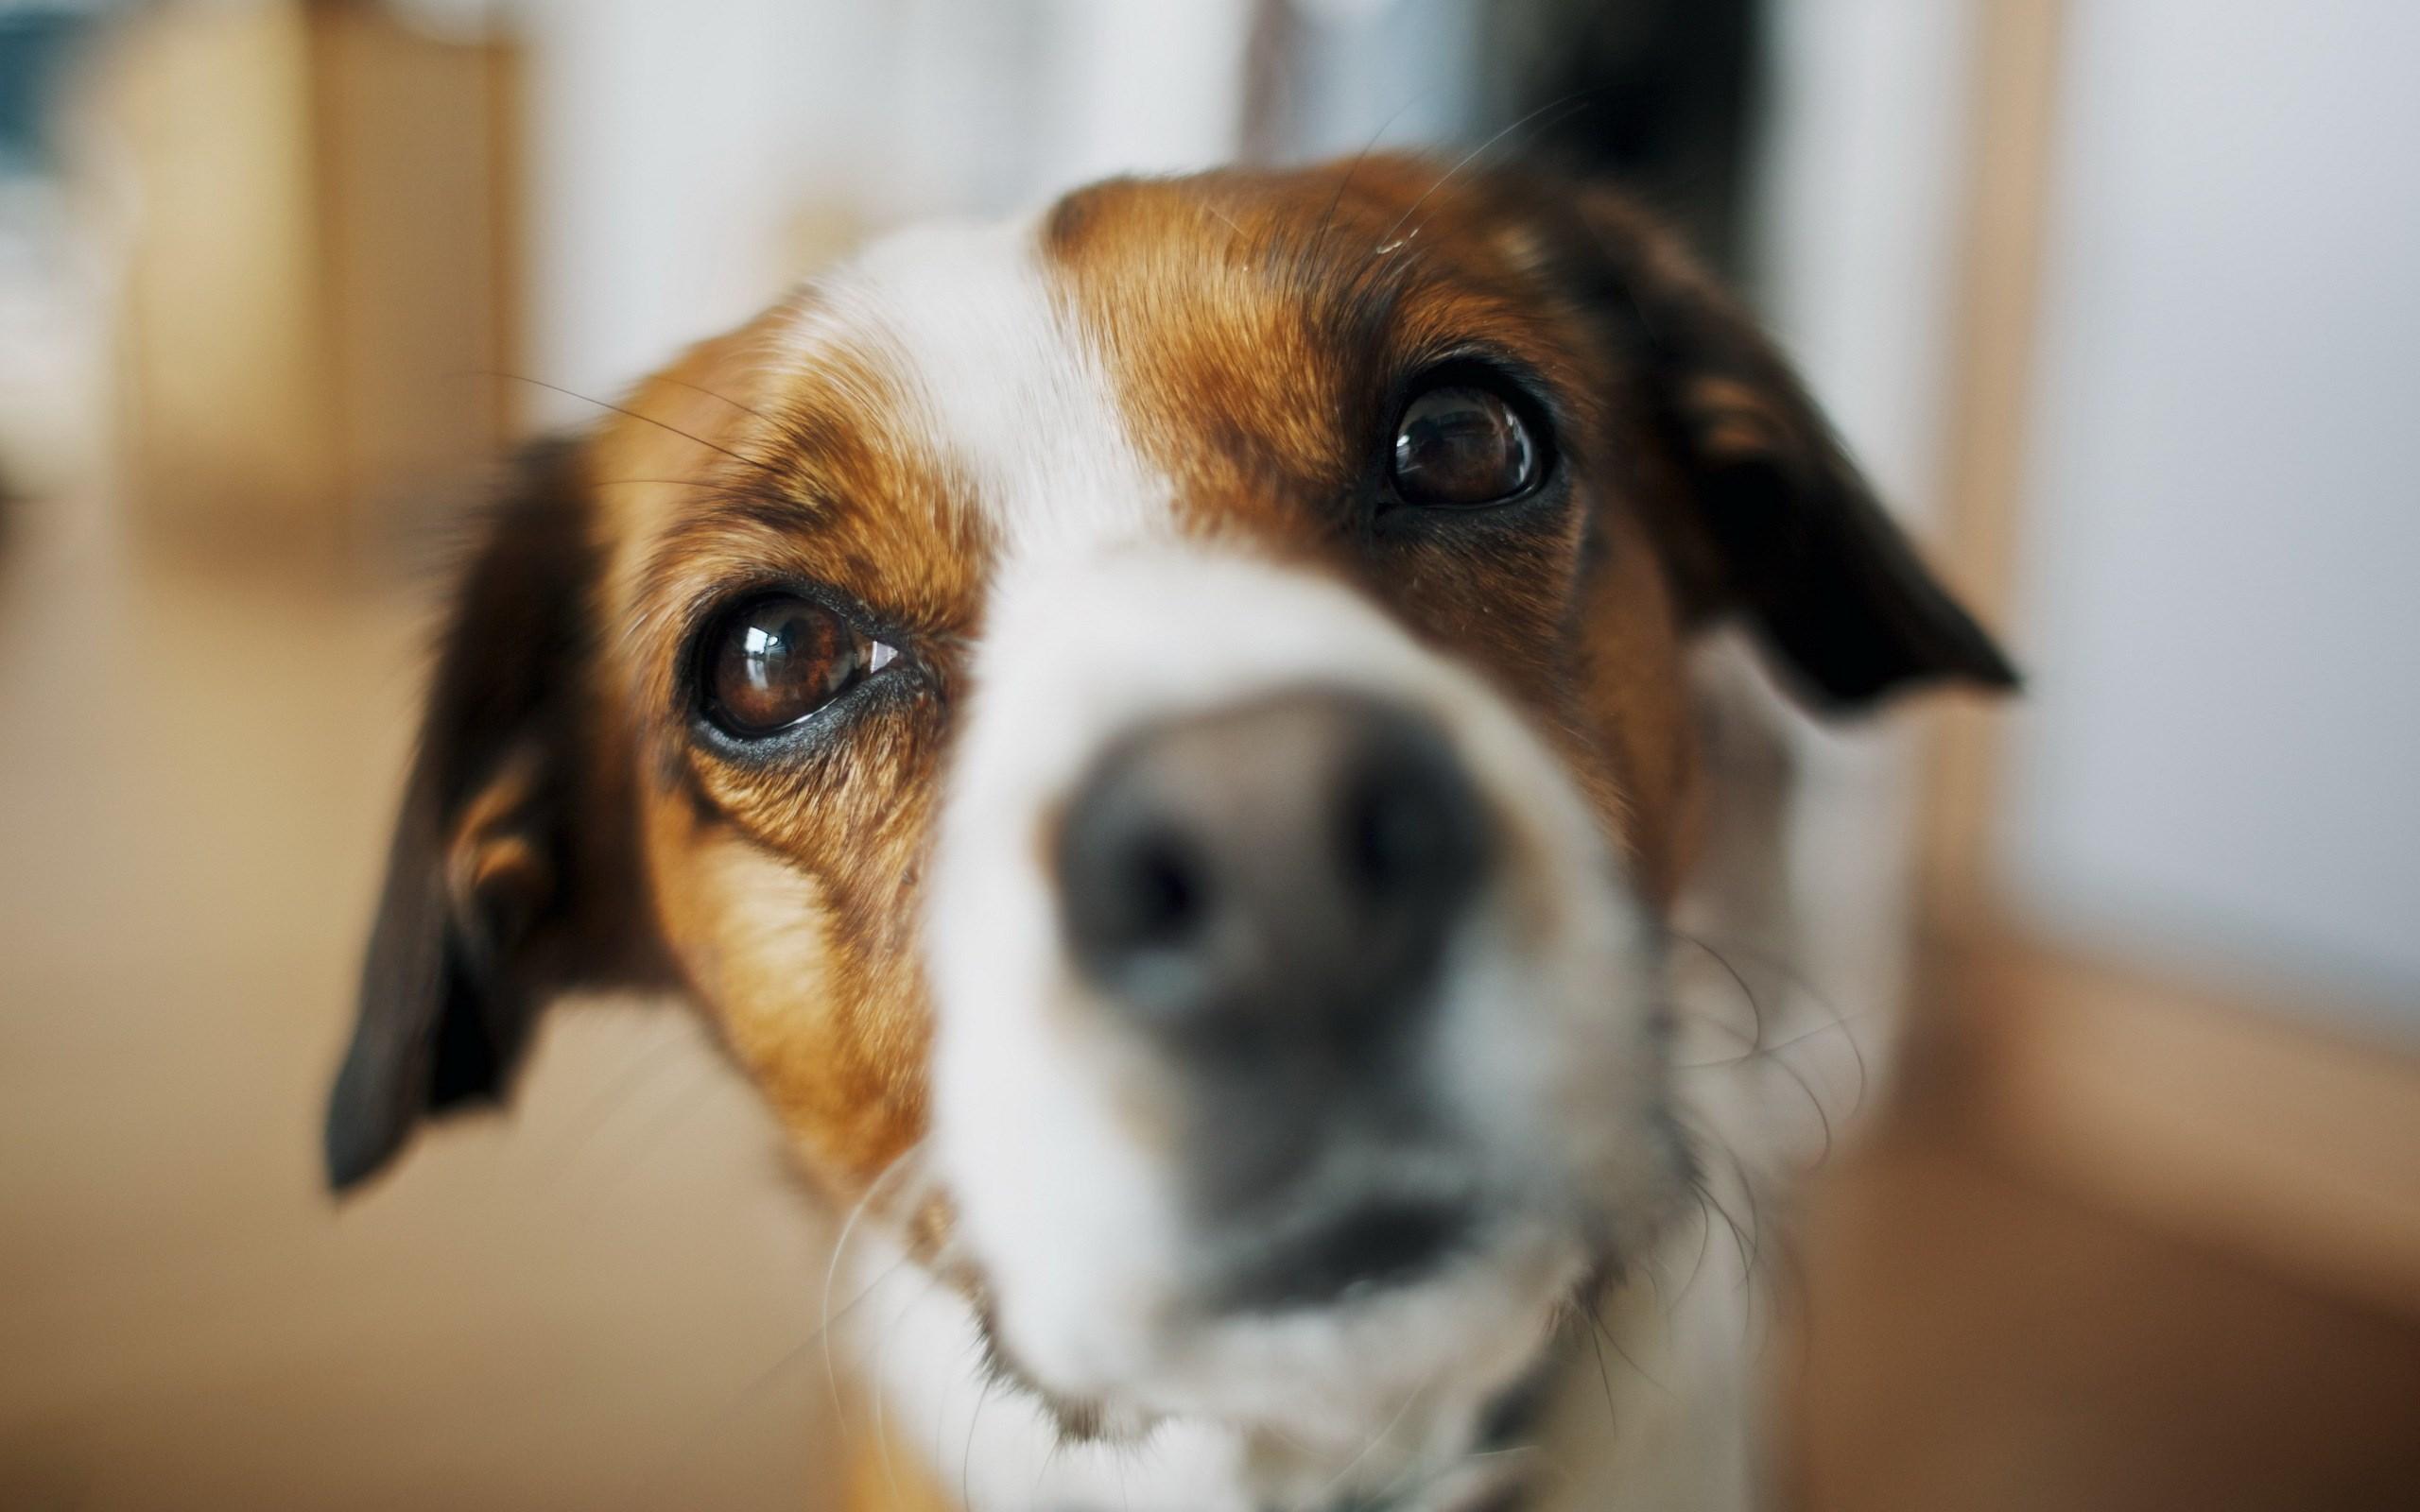 Dog Look Photo Blur